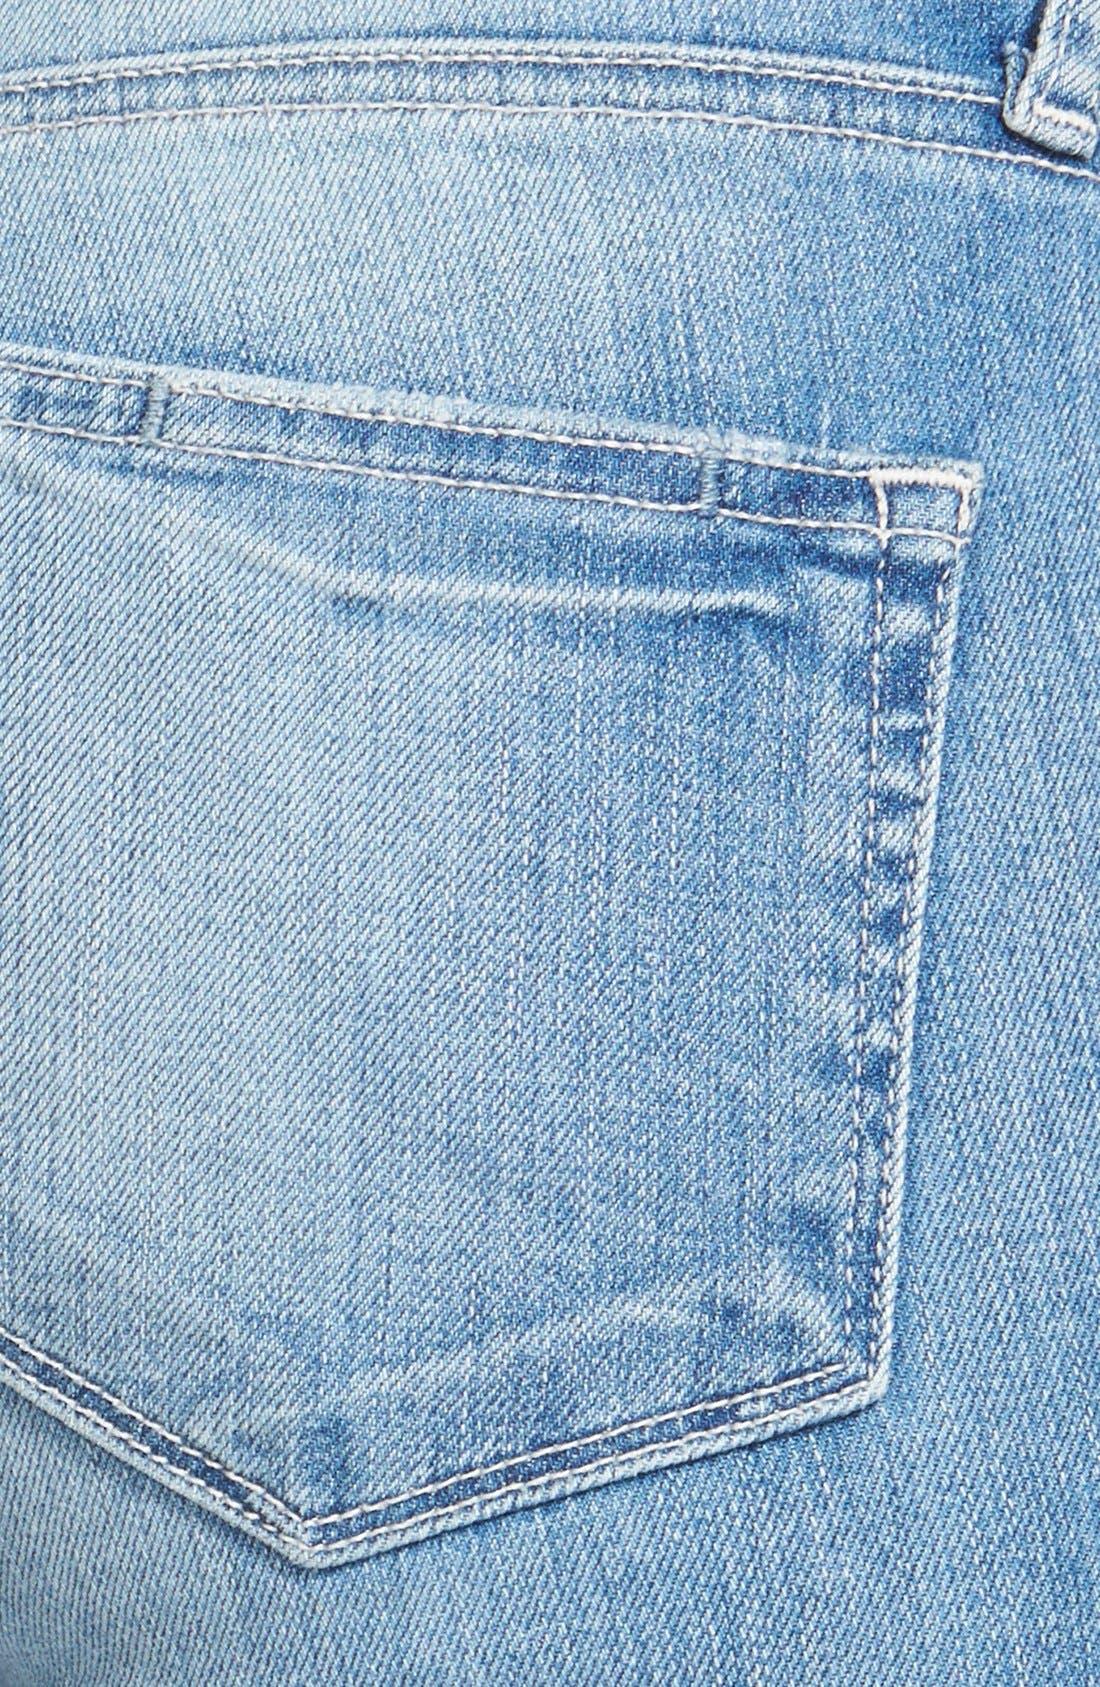 Alternate Image 3  - Paige Denim 'Kylie' Crop Skinny Jeans (Whitley)